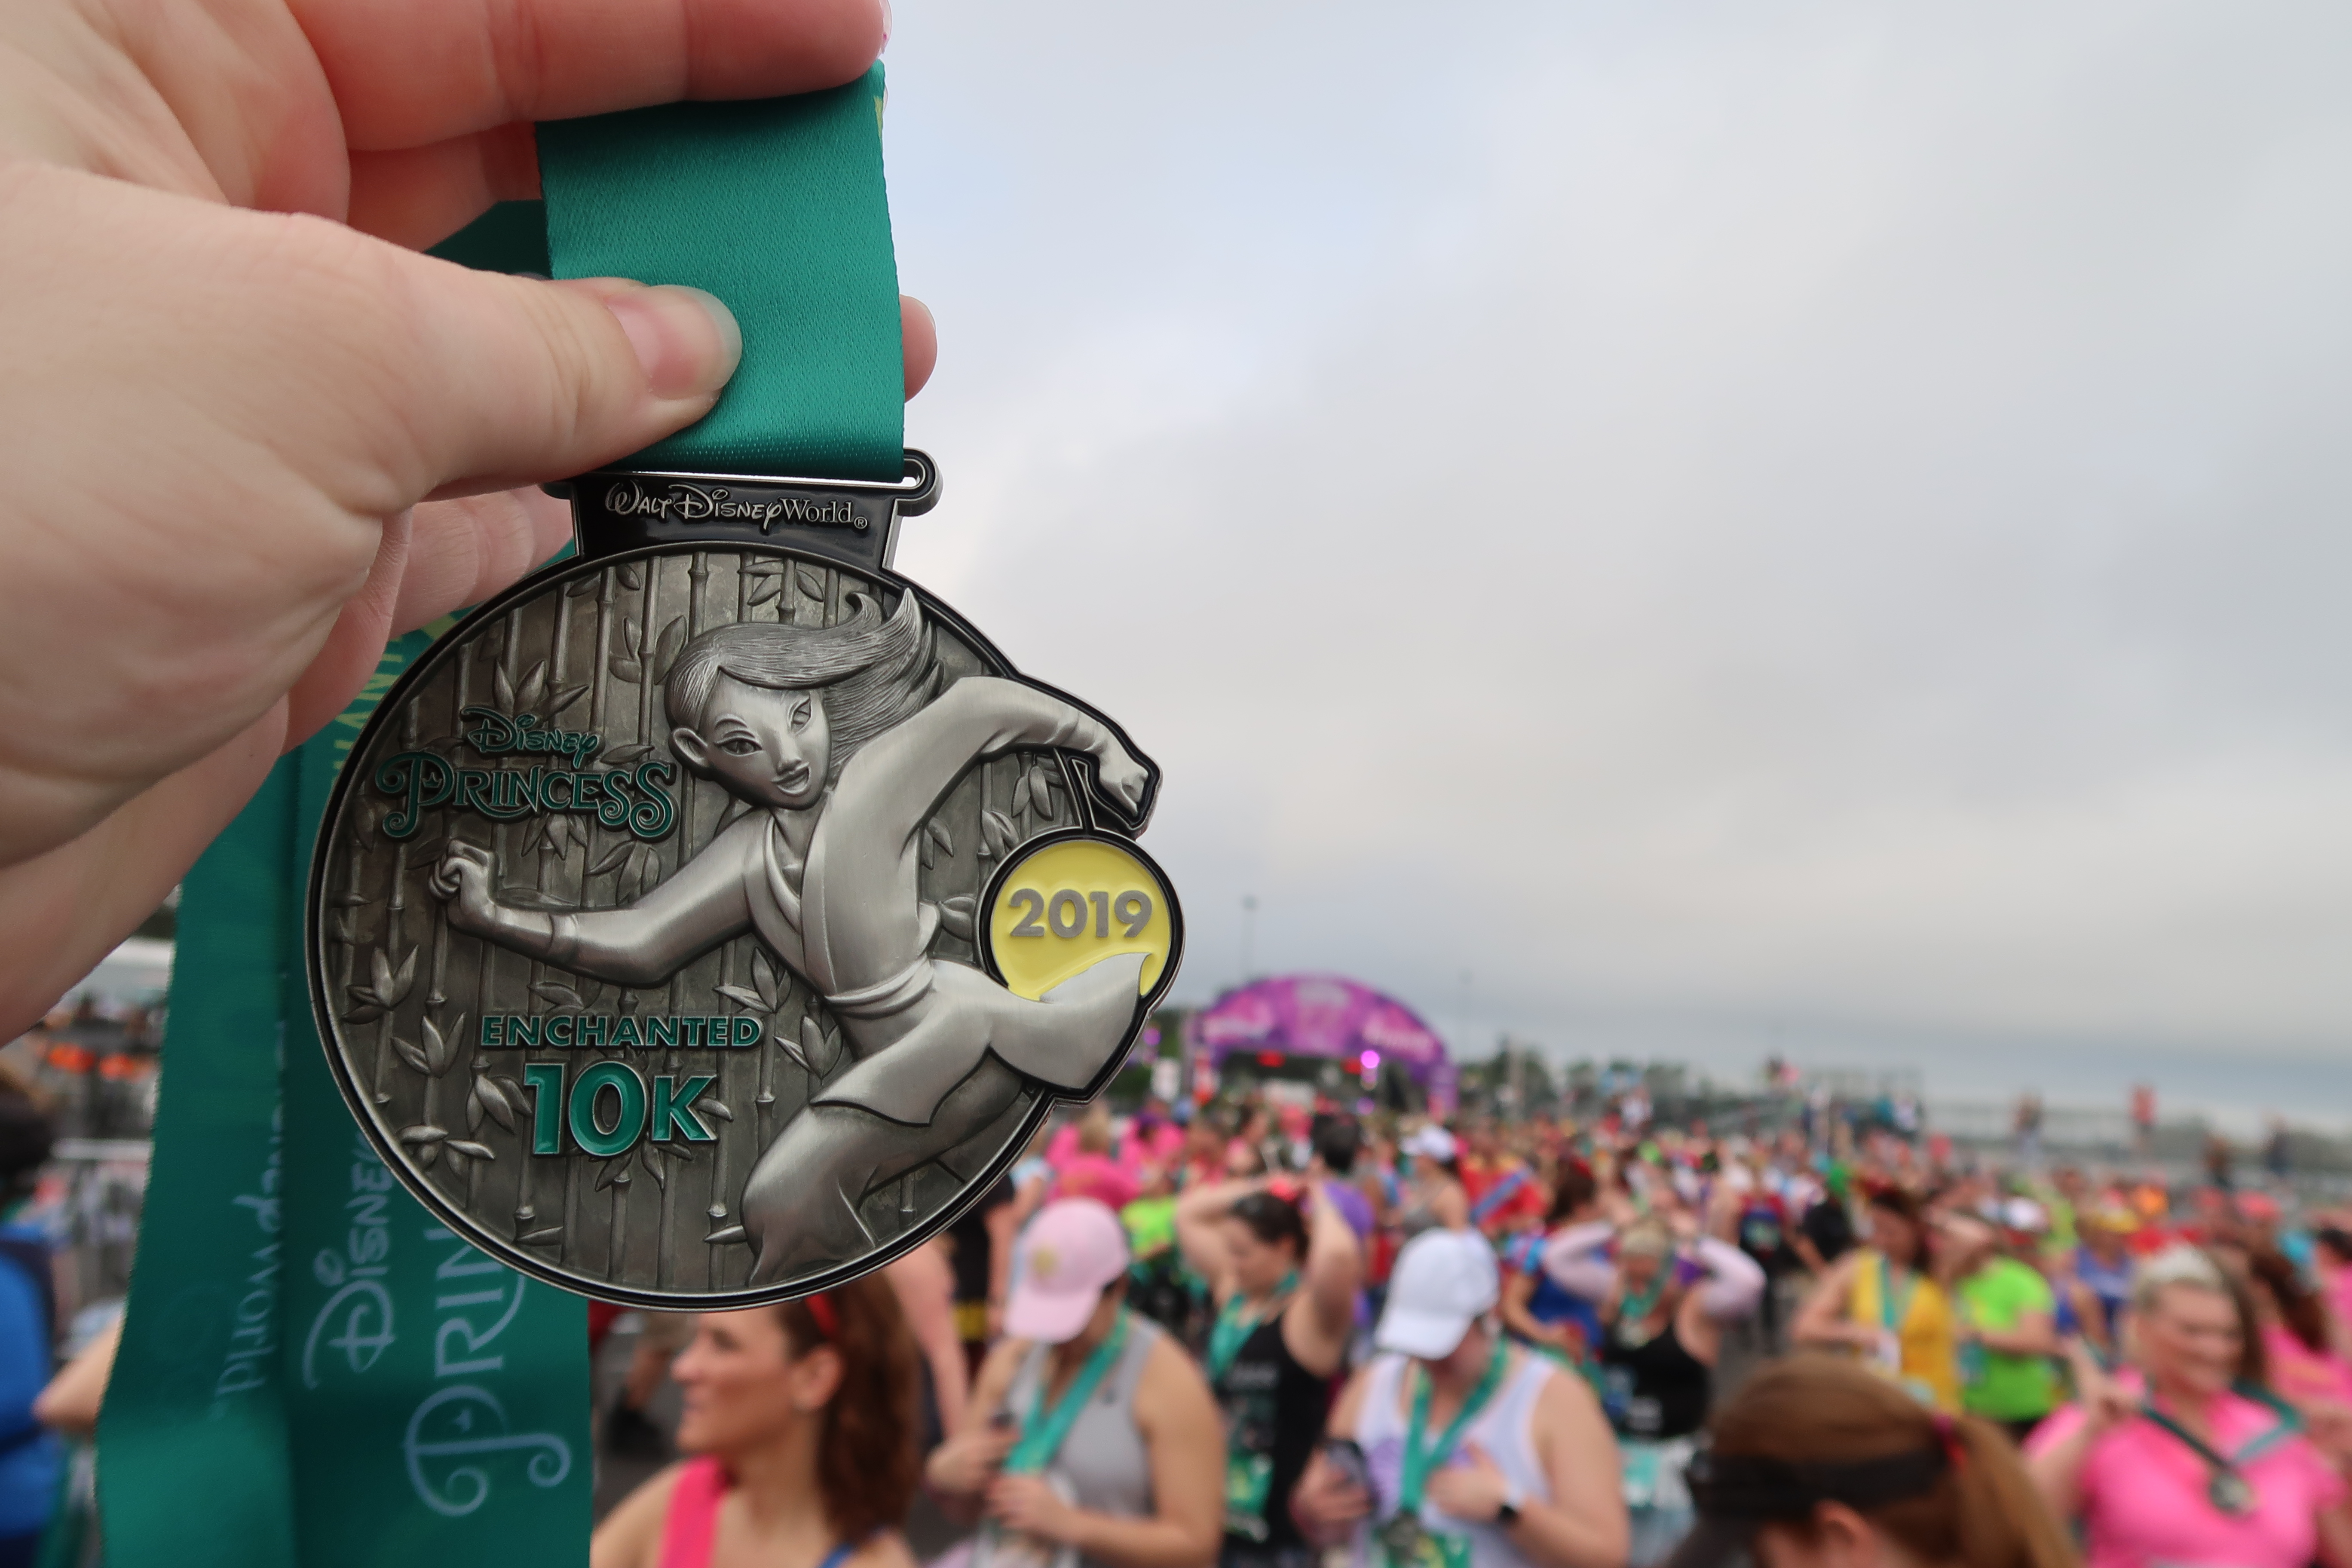 Fairy Tale Challenge 10K medal